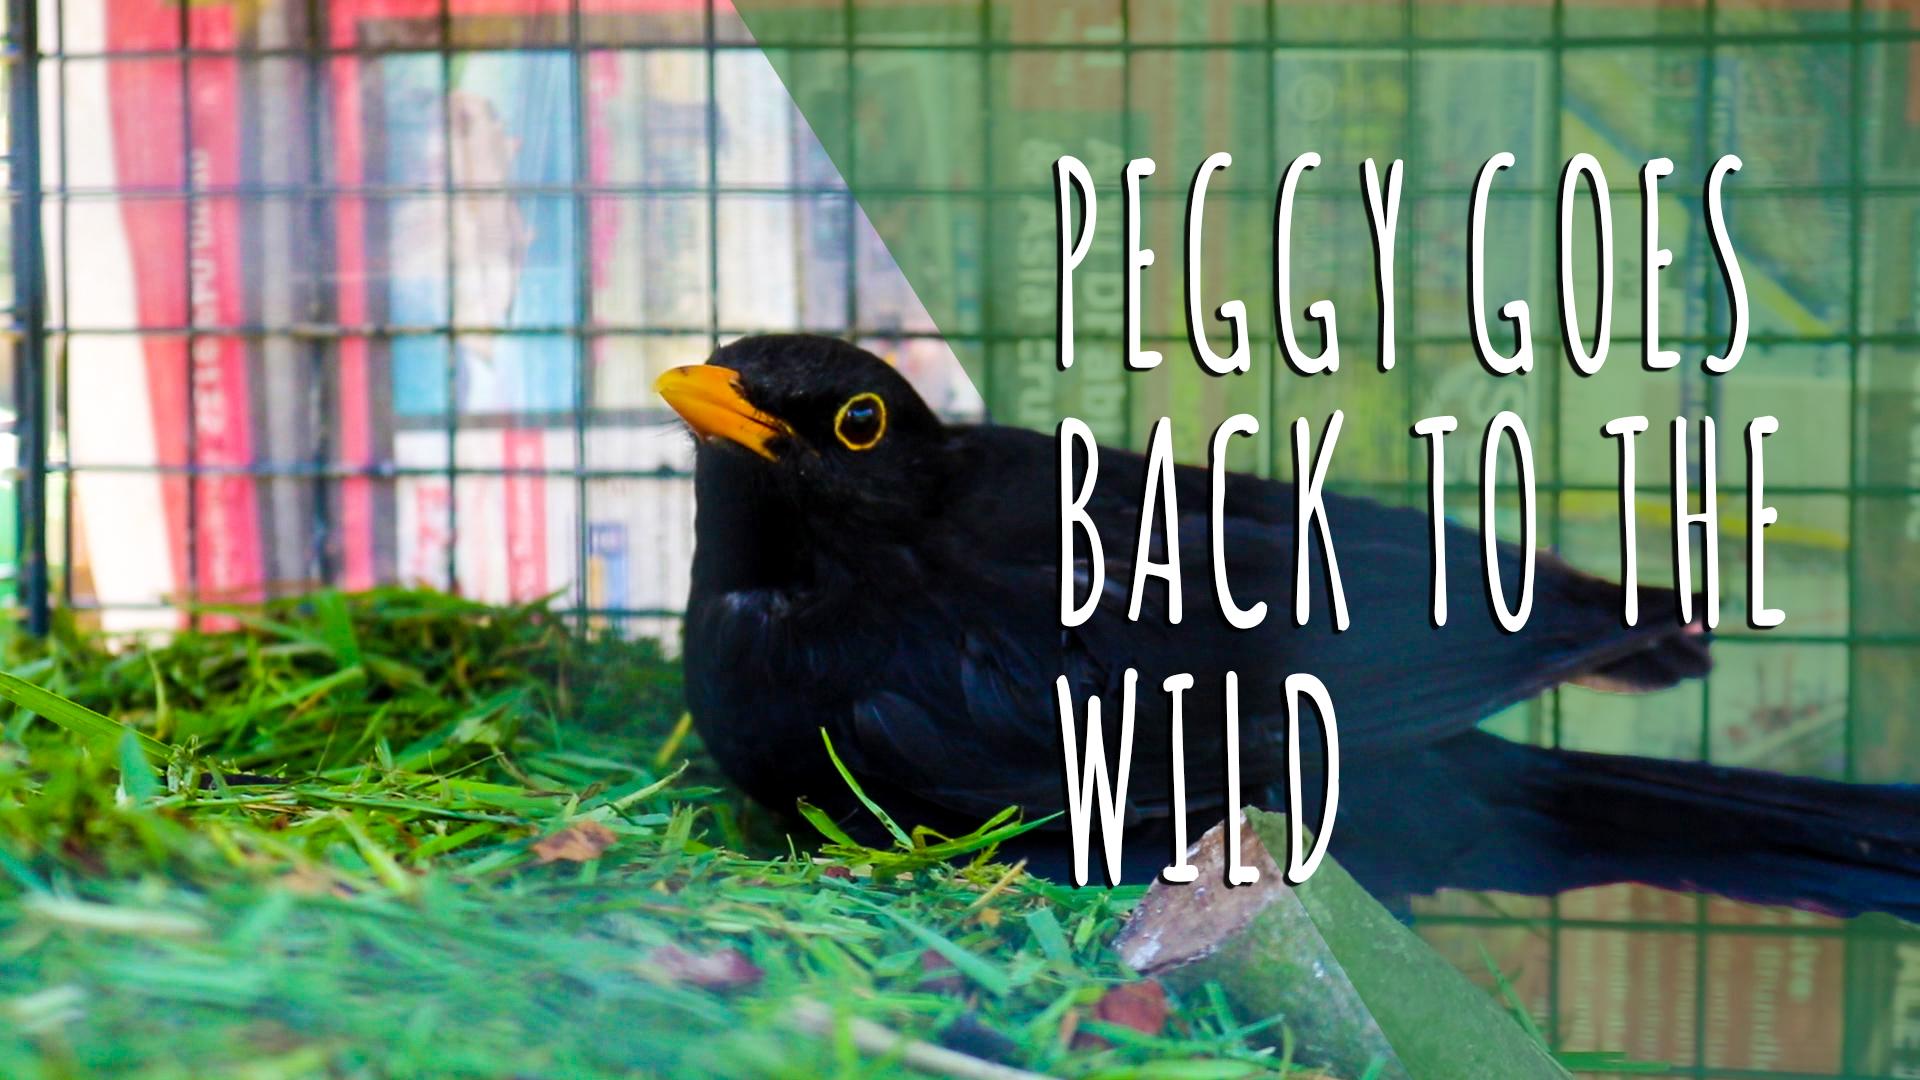 Peggy Goes Wild